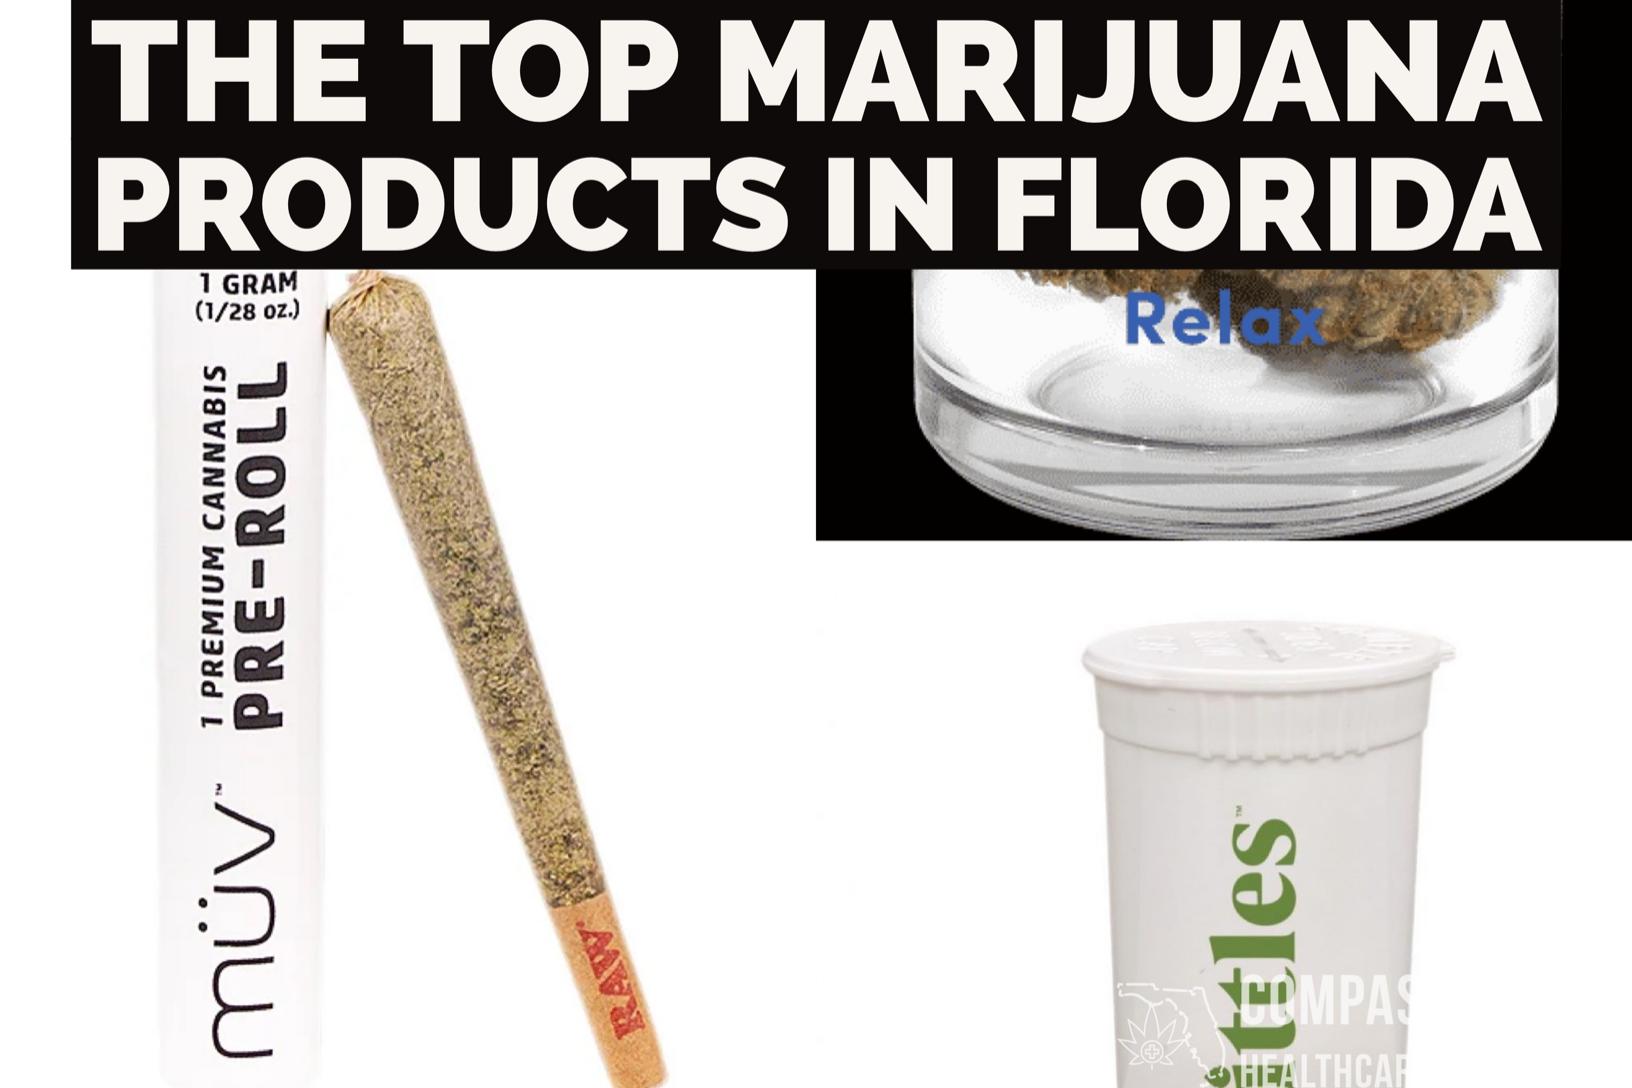 Top Marijuana Products In Florida